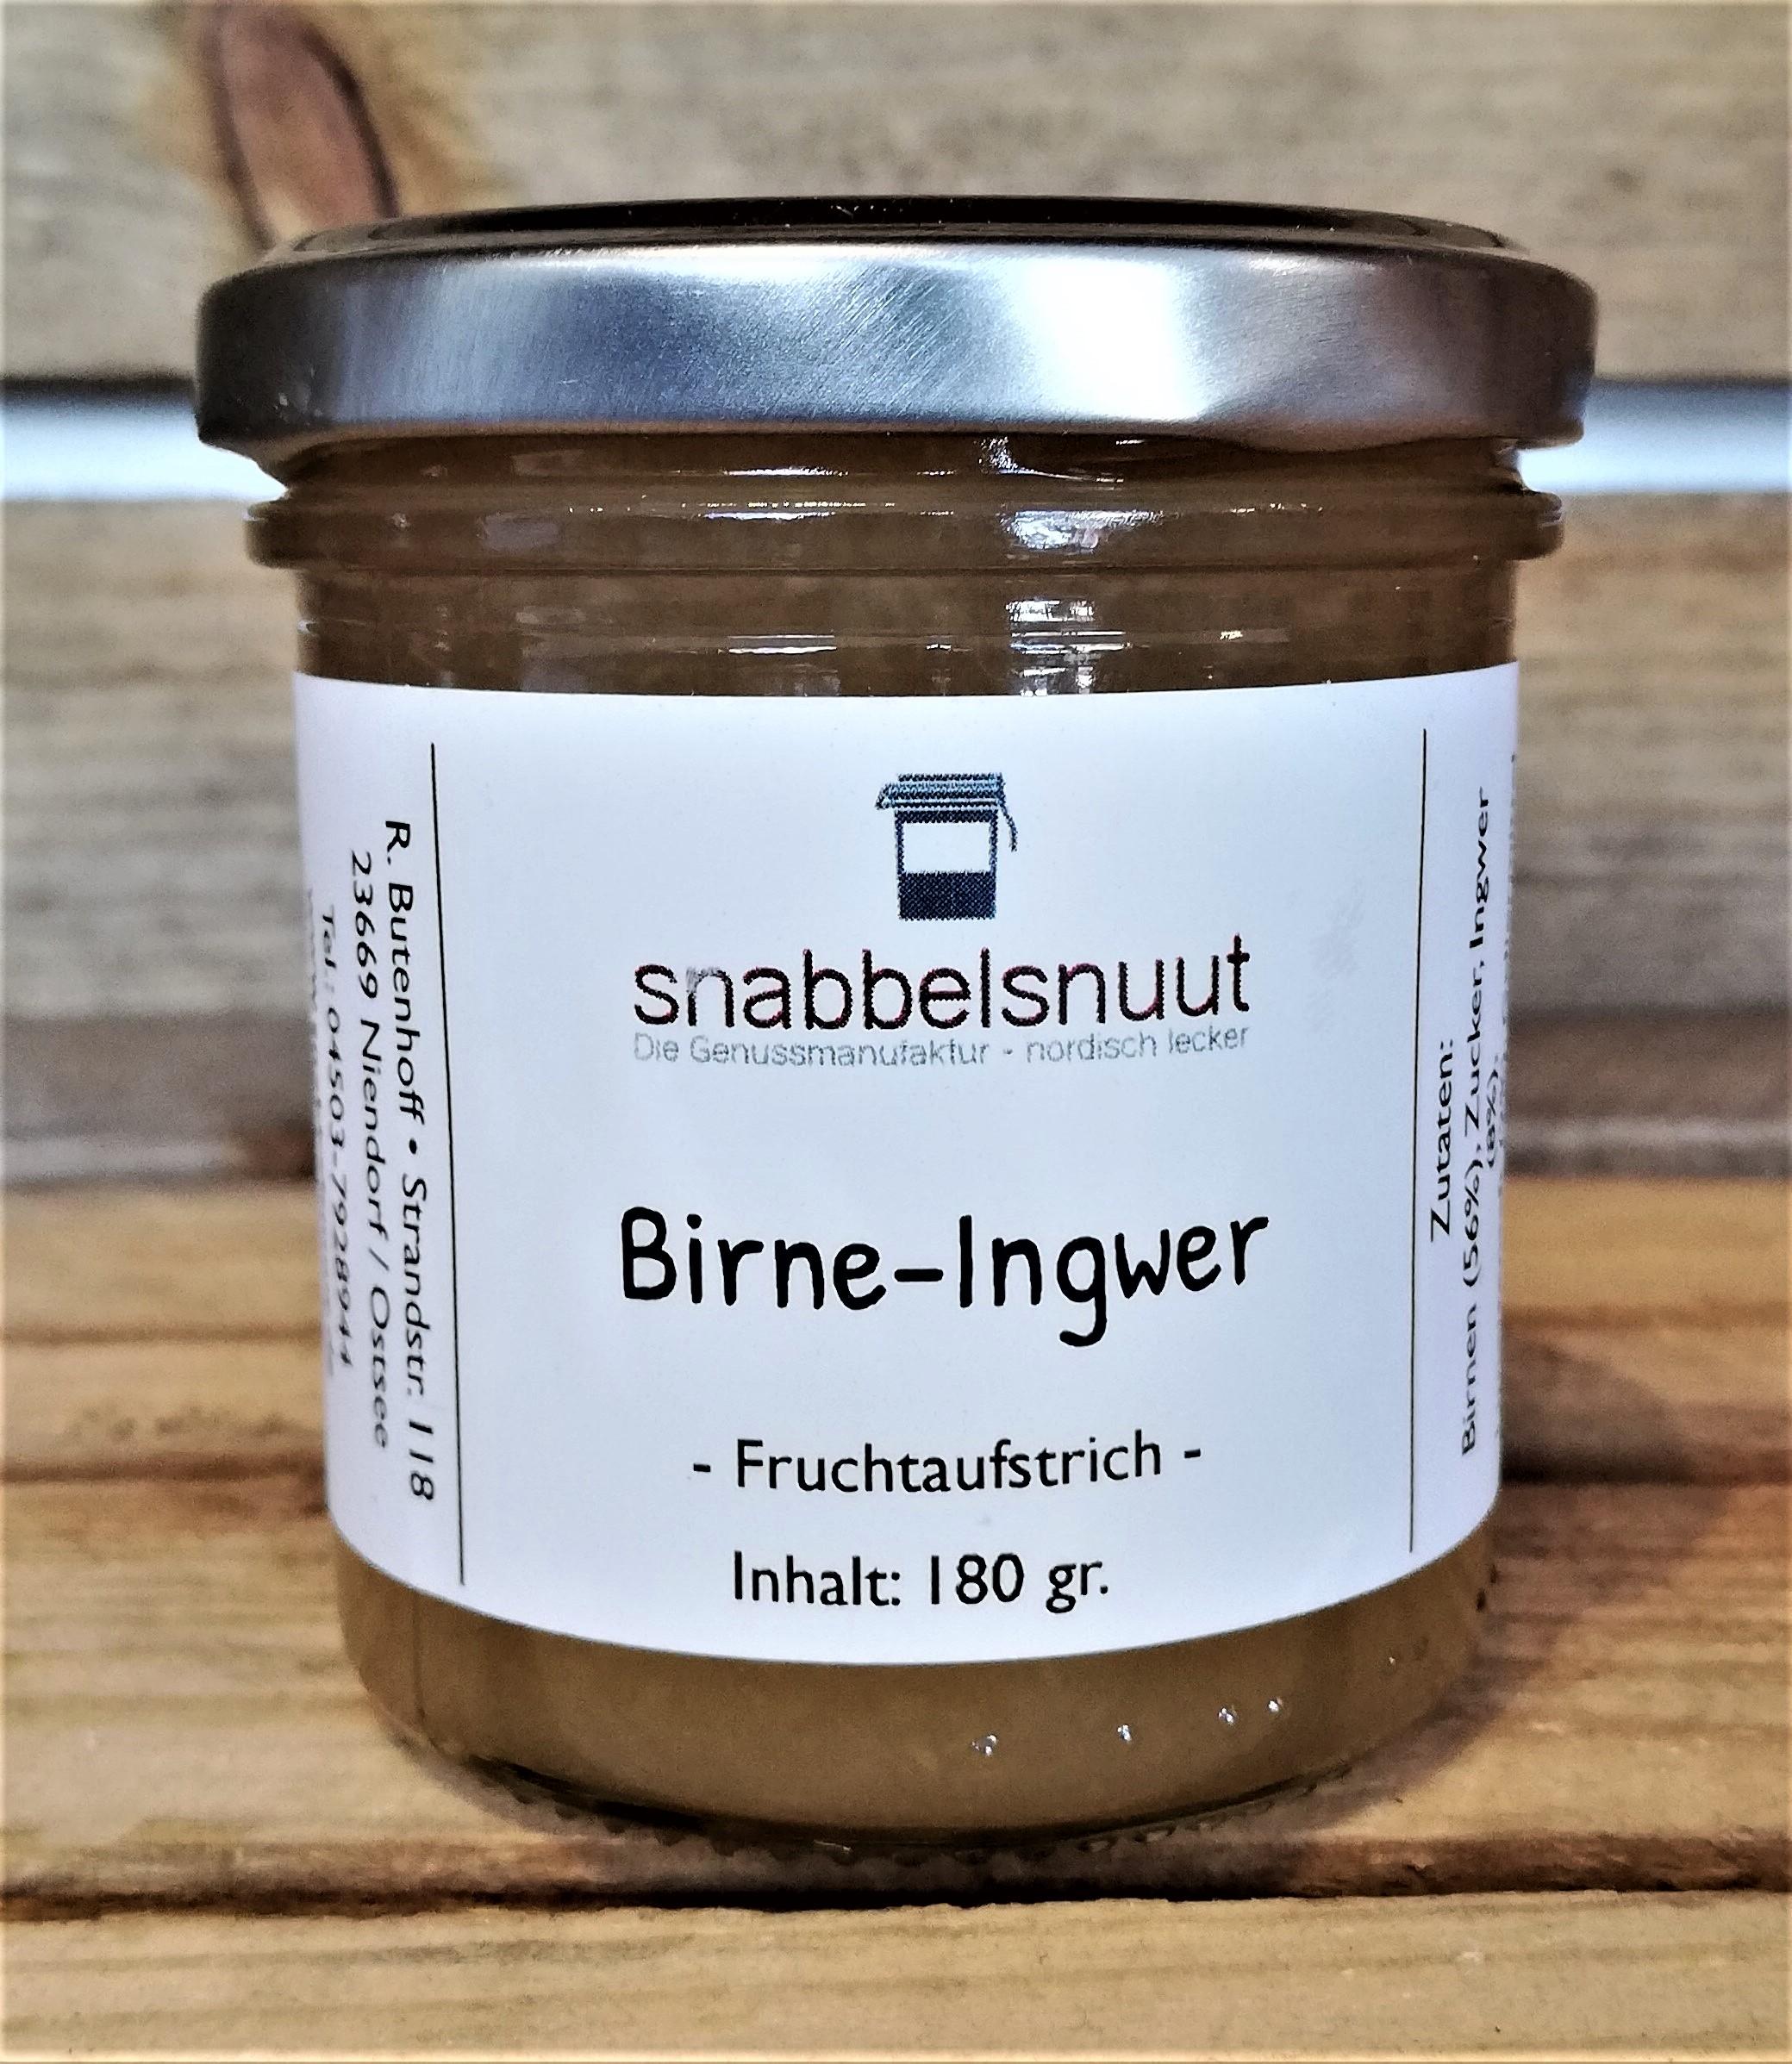 Birne-Ingwer